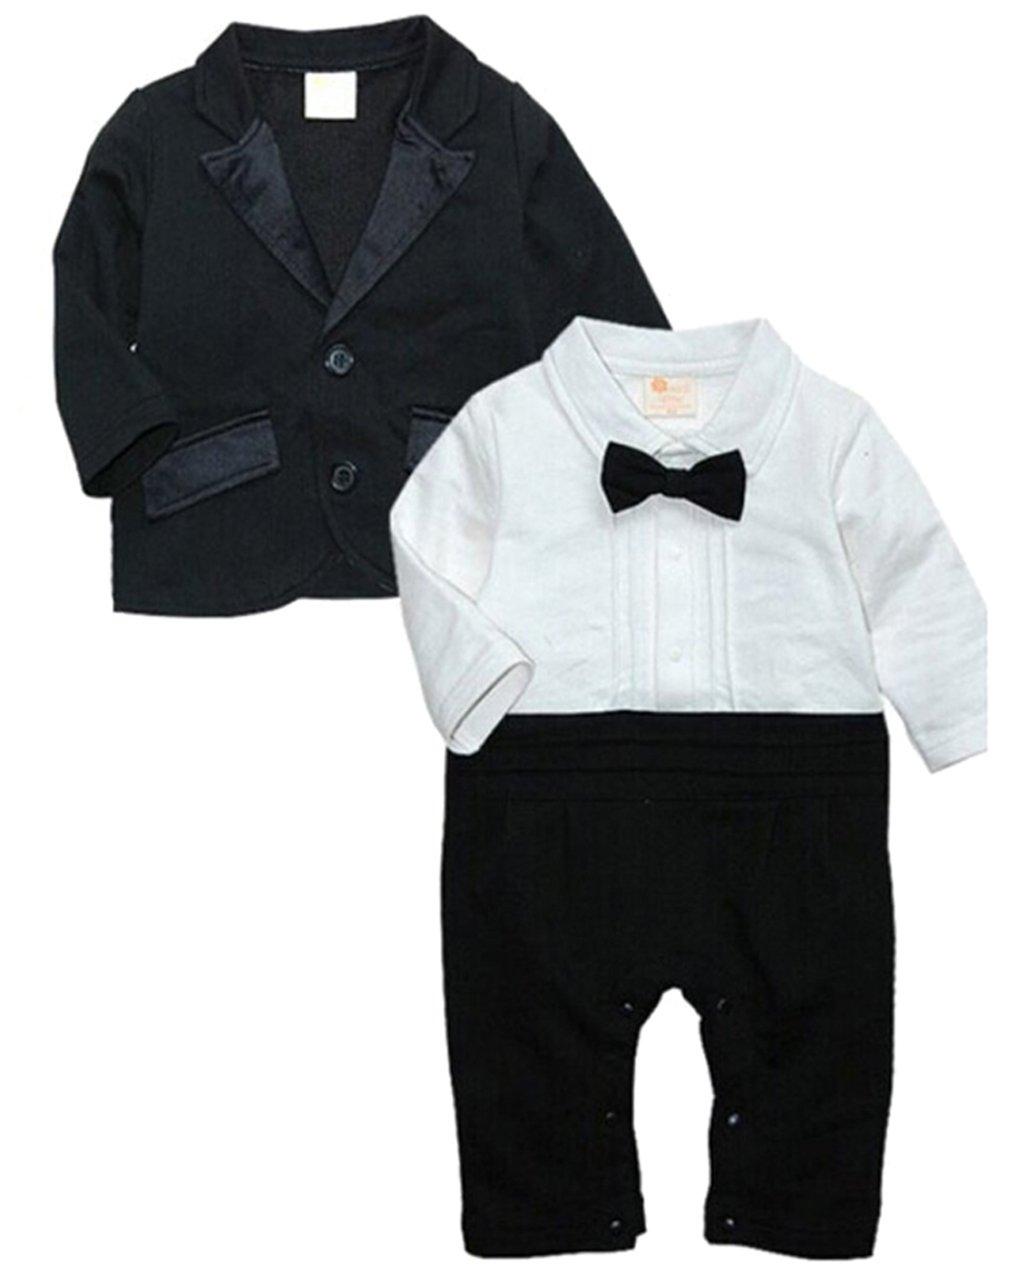 EGELEXY Baby Boys Tuxedo Wedding Romper and Jacket Formal Wear Suit 3-6months Black